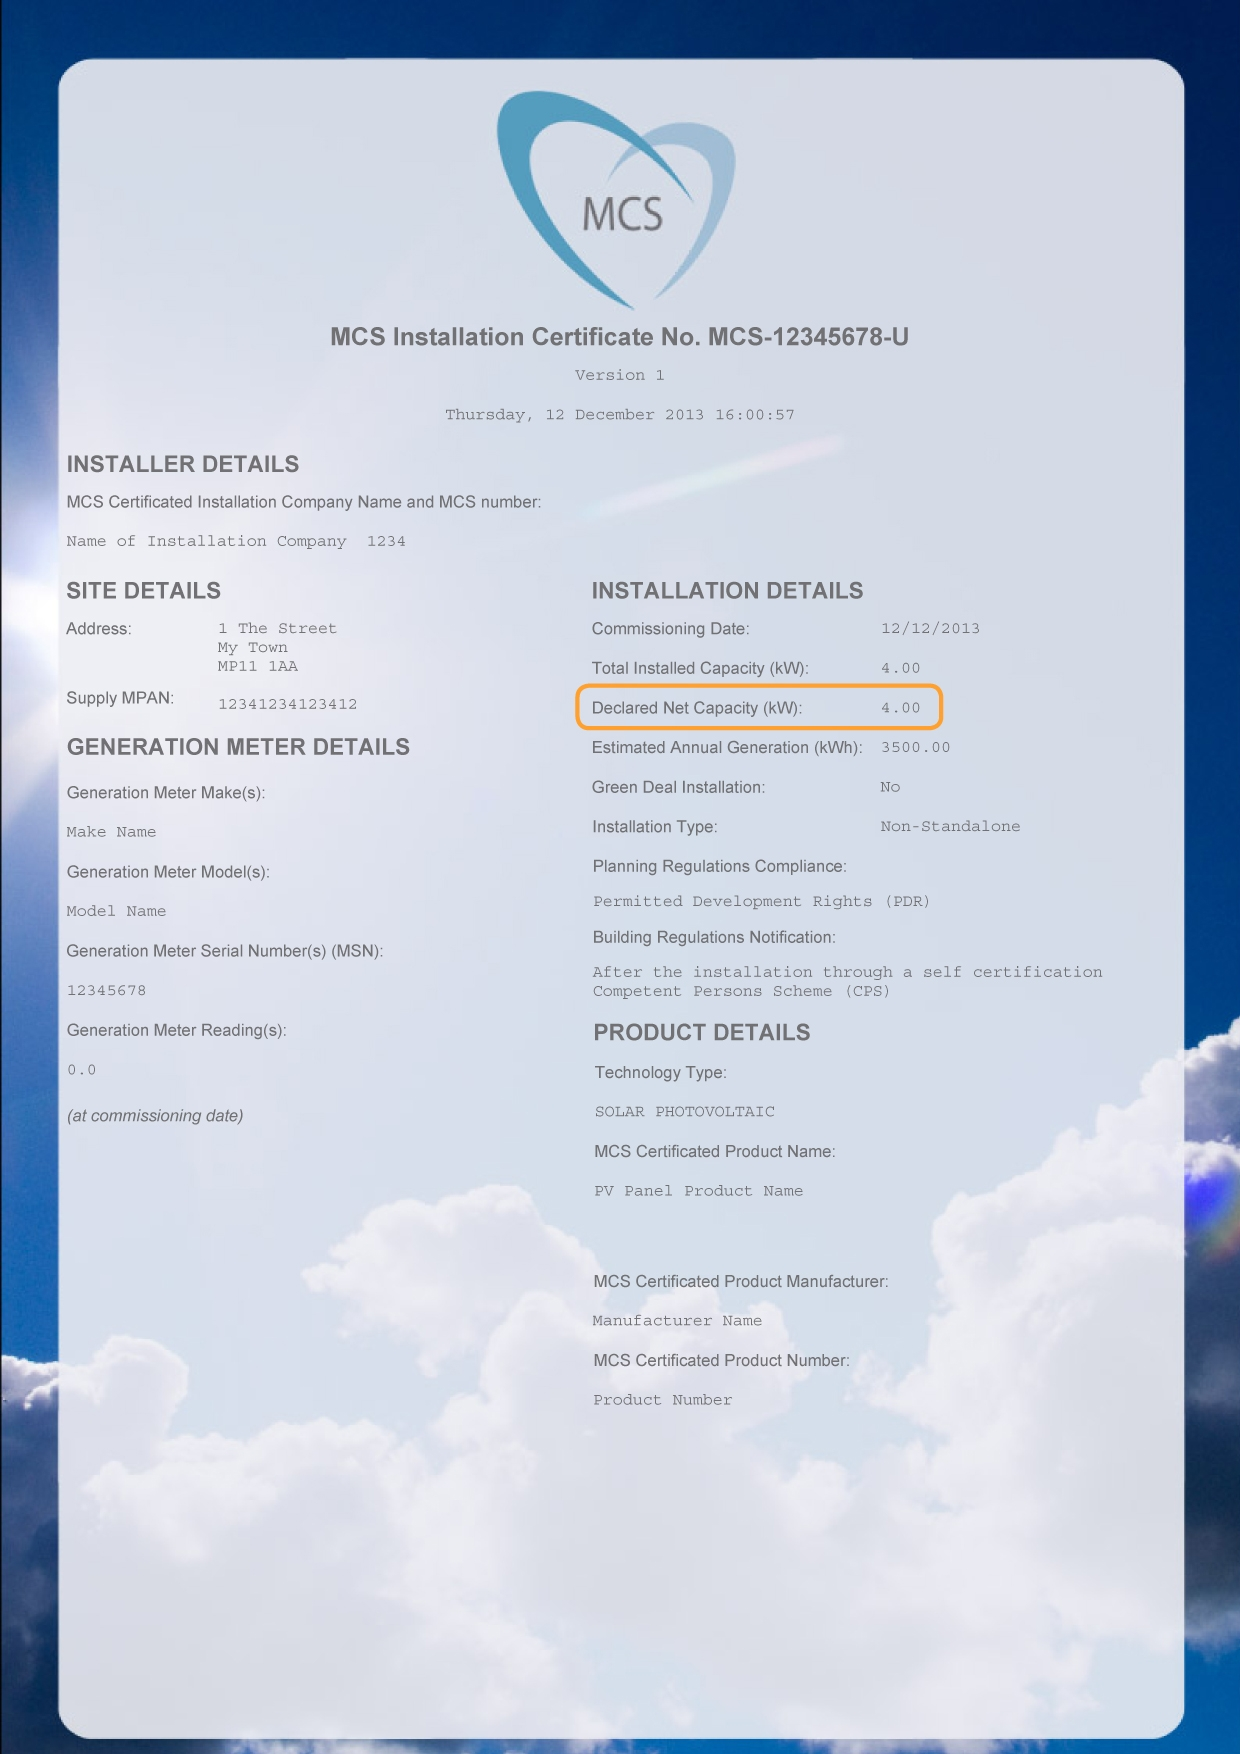 MCS installation certificate - declared net capacity